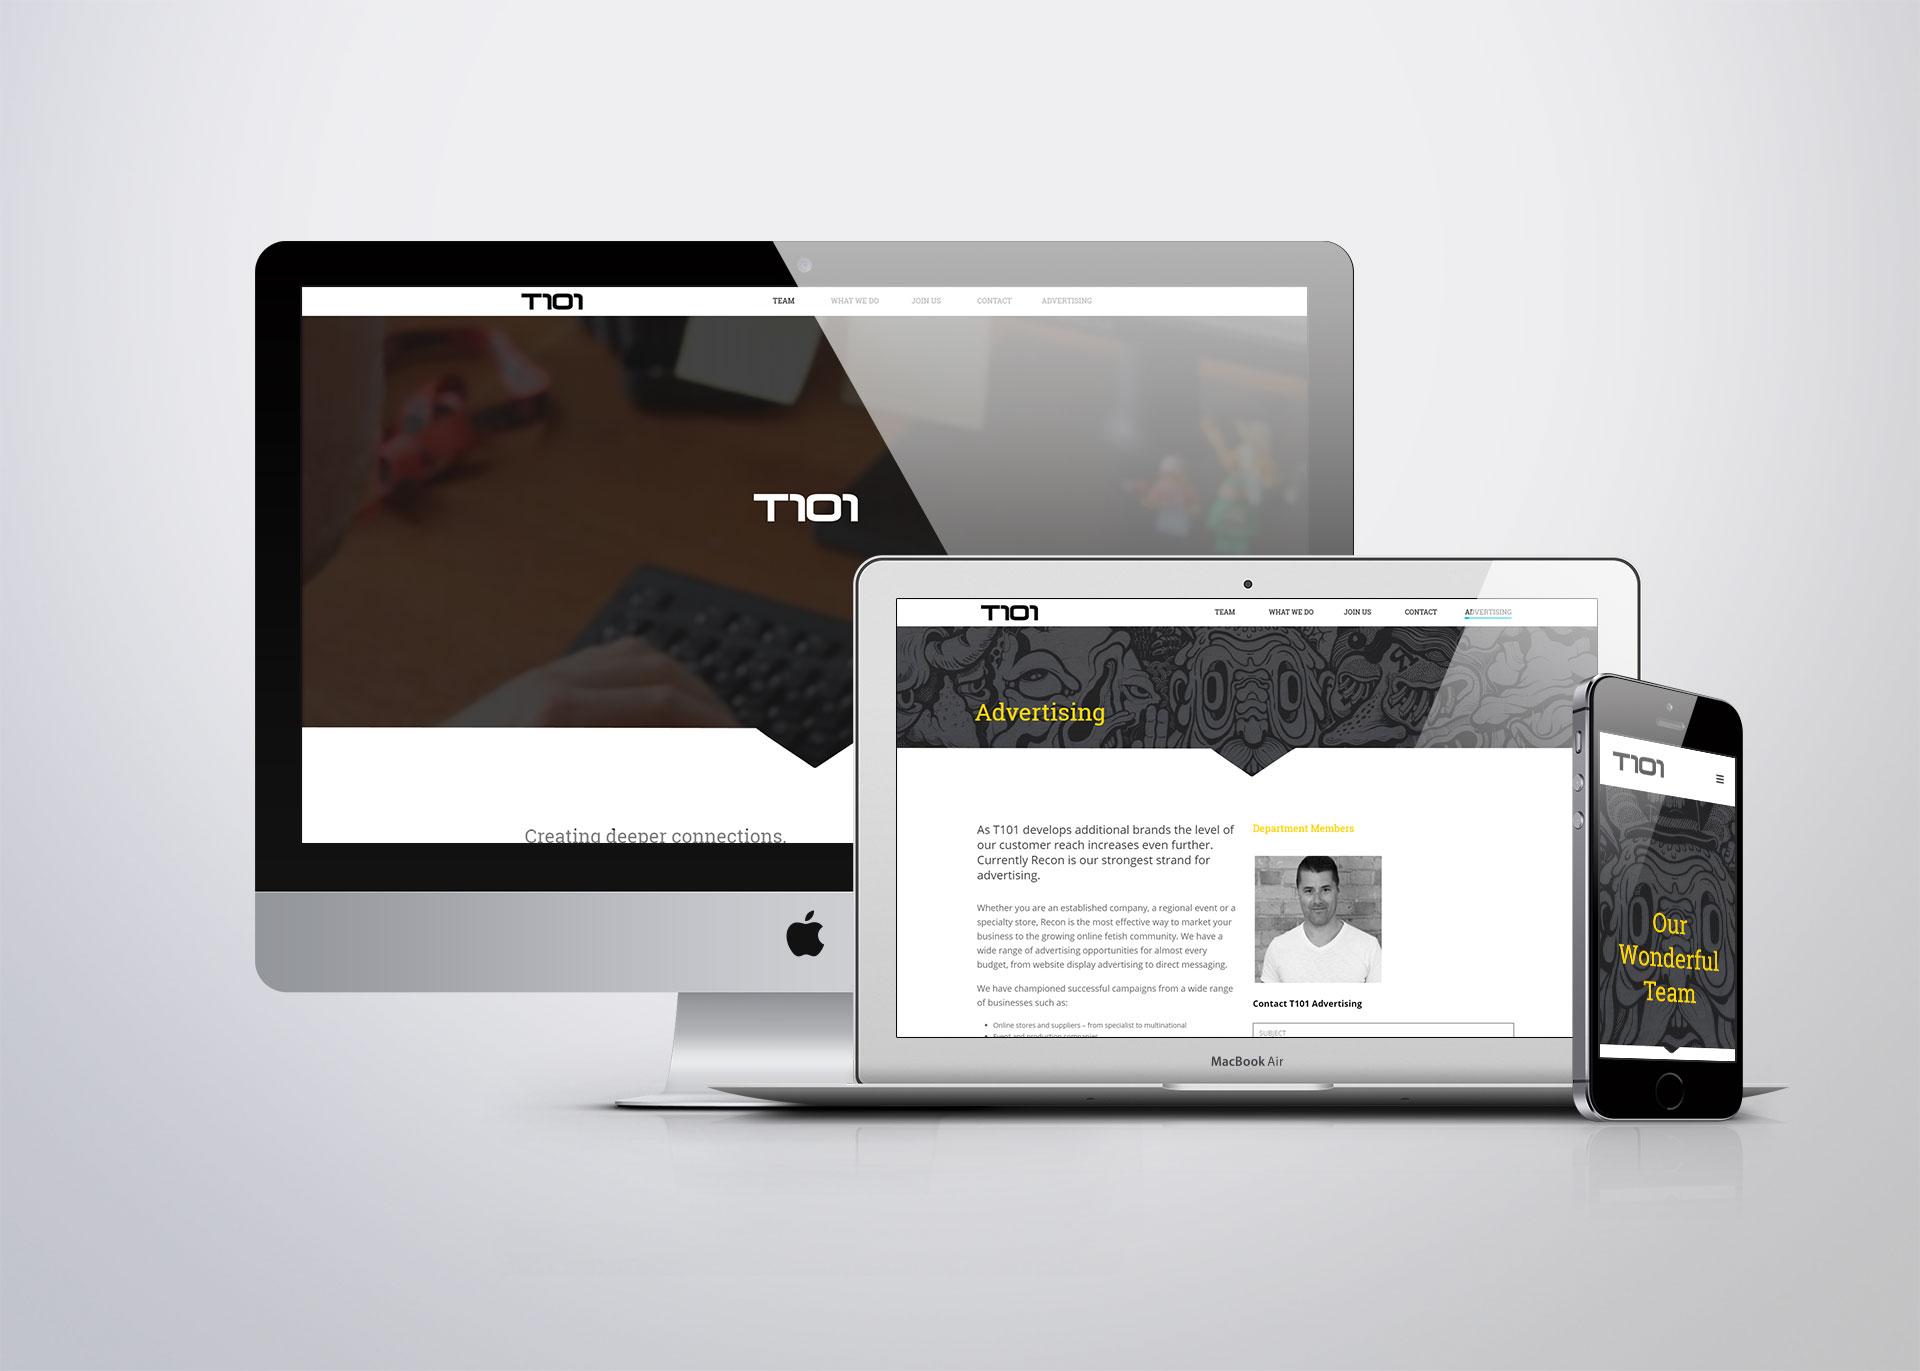 marketing to china - t101 mobile ipad dekstop